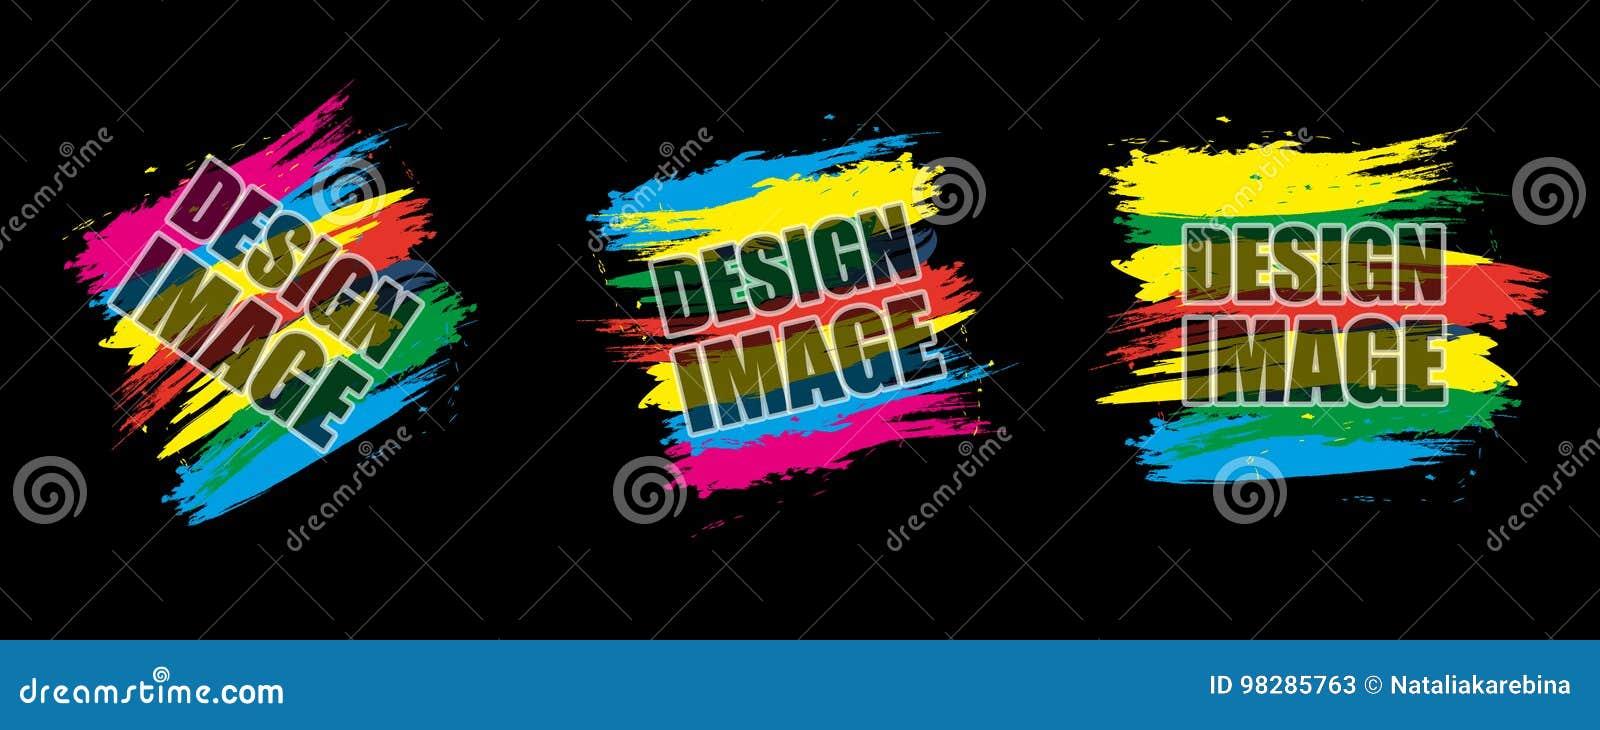 Set colorful modern frame dynamic design elements for a flyer dynamic design elements for a flyer business cards brochures presentations etc vector illustration reheart Choice Image